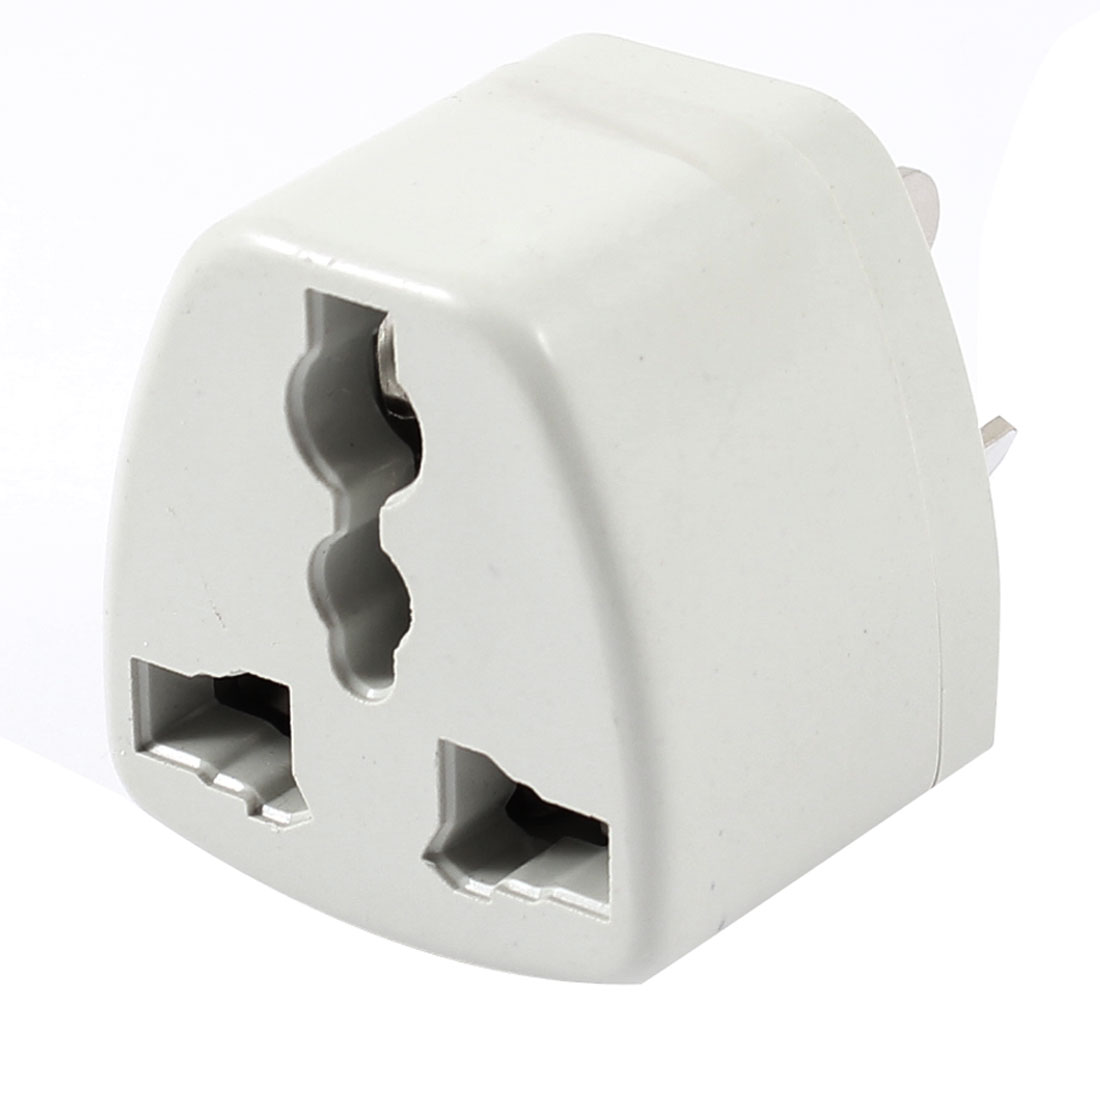 AU 3 Pin Plug to EU/US/AU 3 Pin Socket White 250VAC 10A Travel Adapter Converter